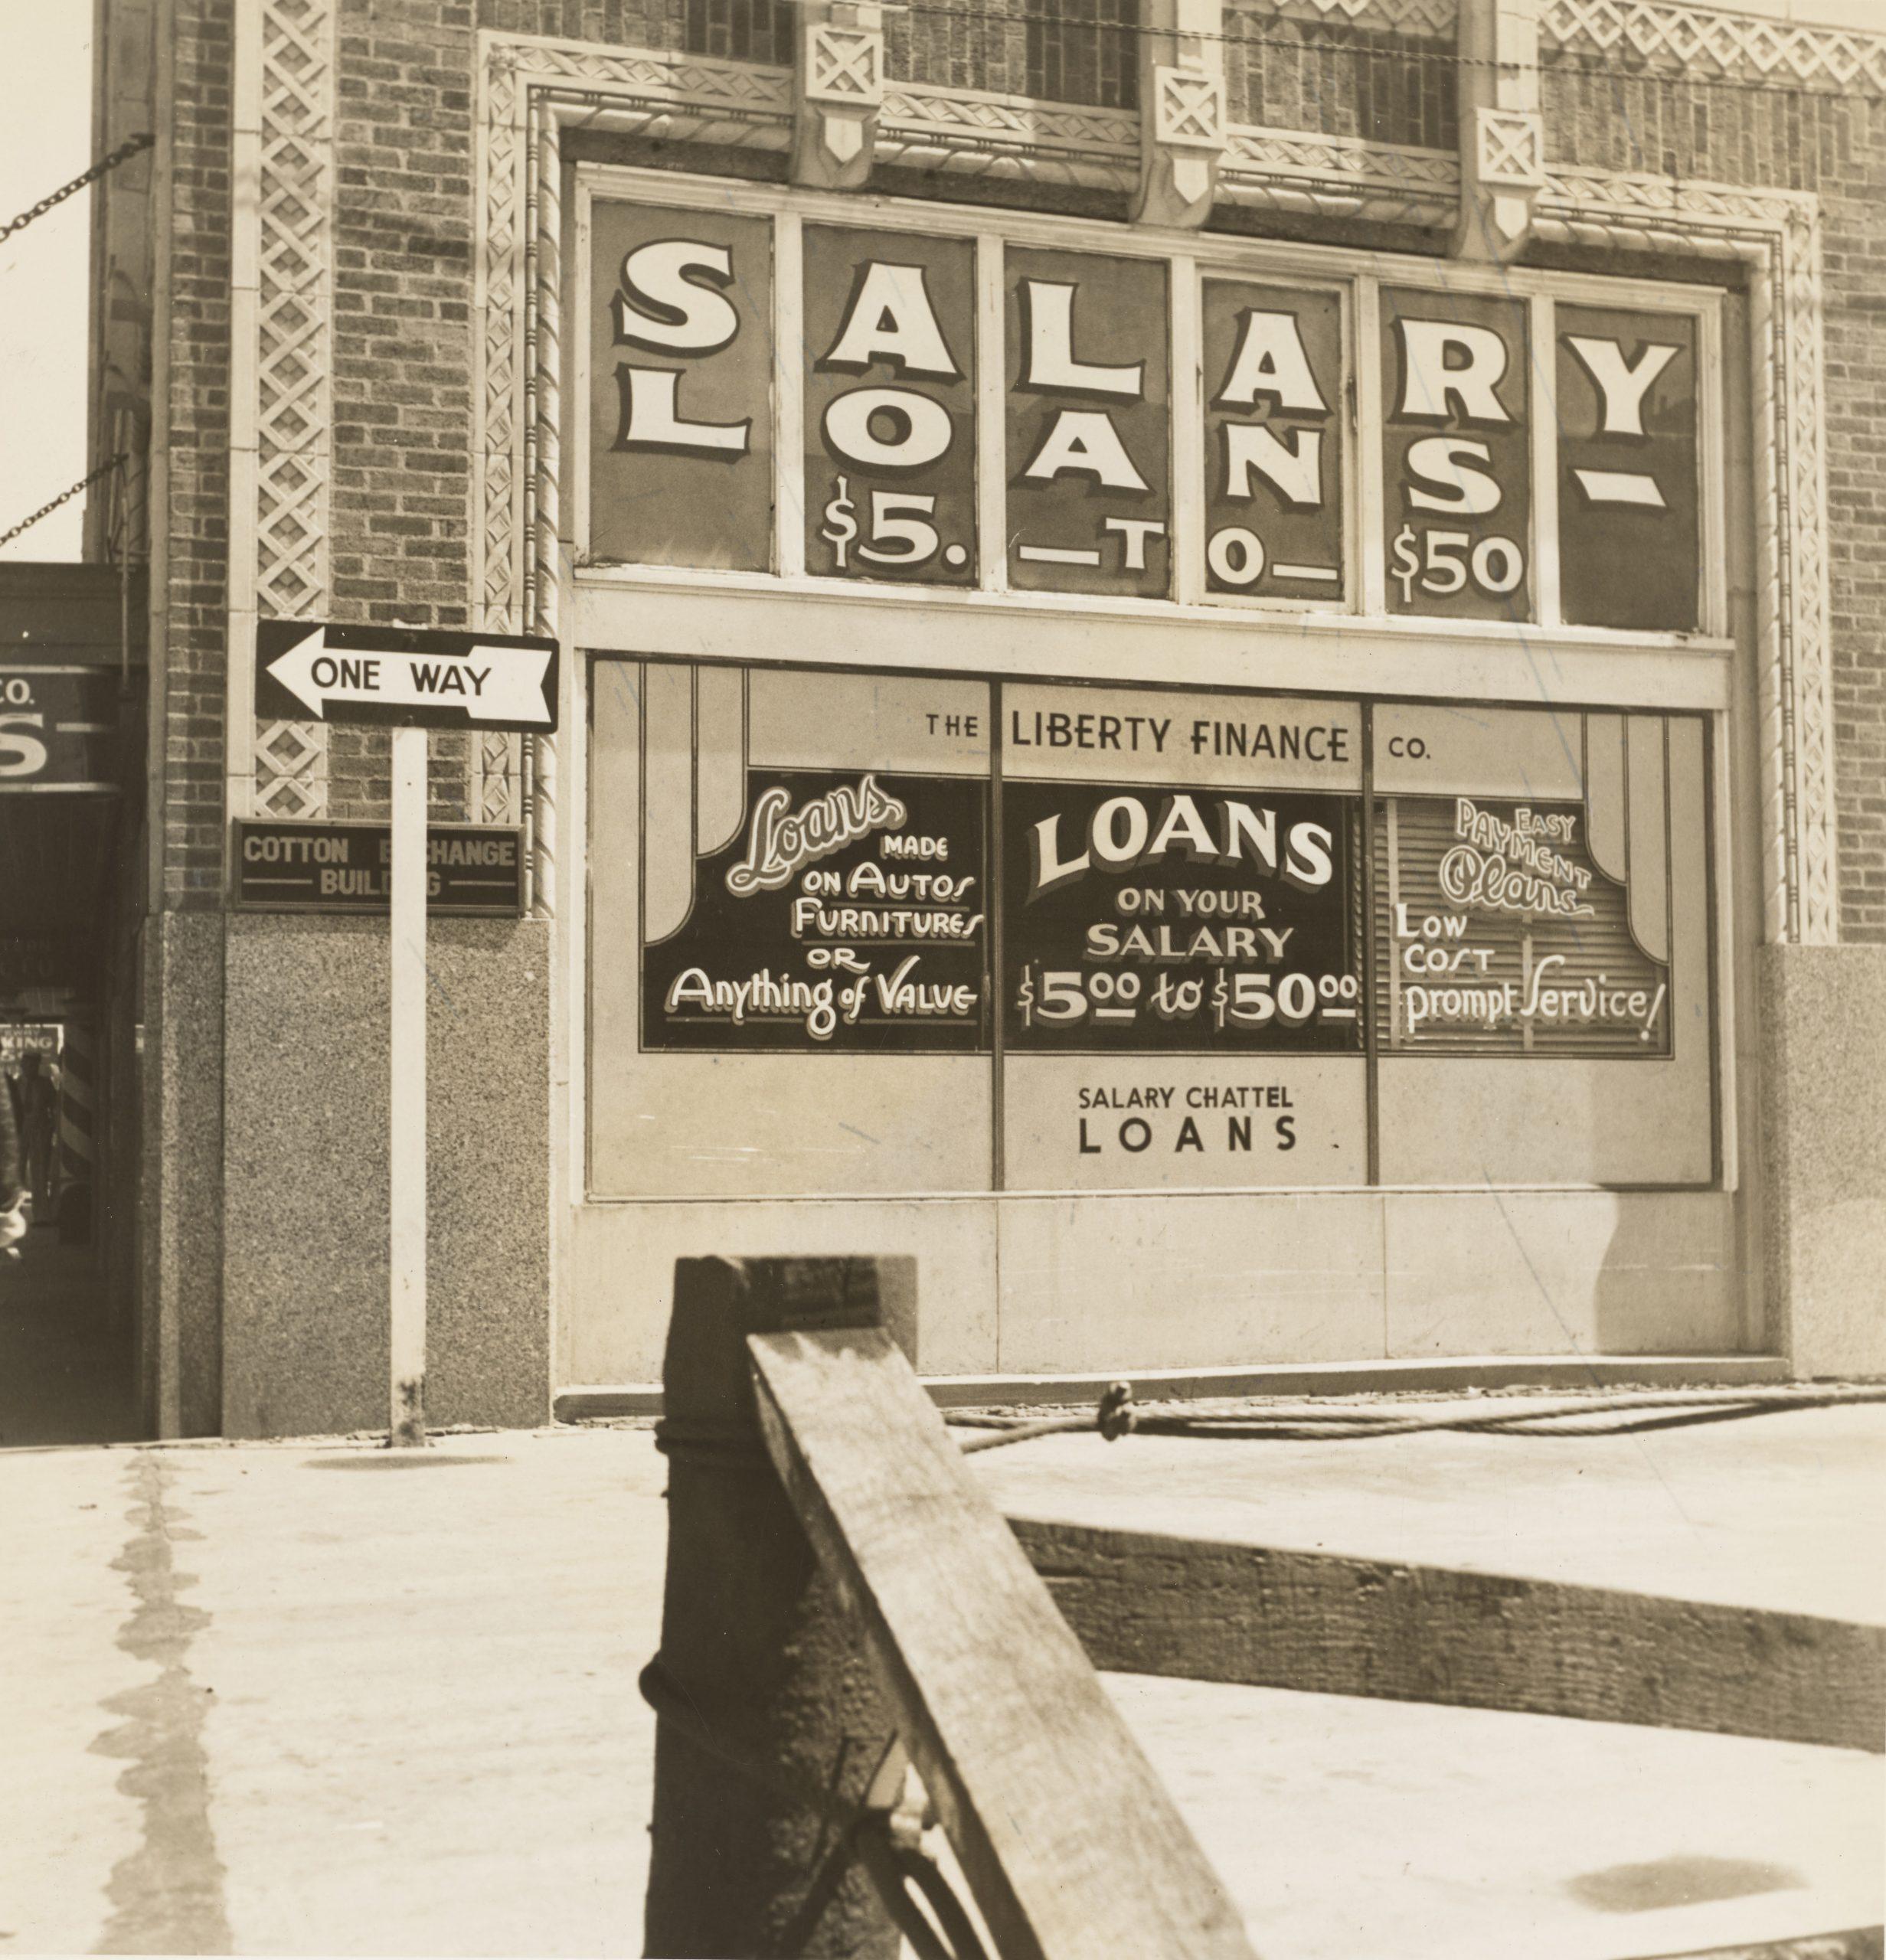 Dorothea Lange photograph of the Liberty Finance Company in Oklahoma City, OK, 1937